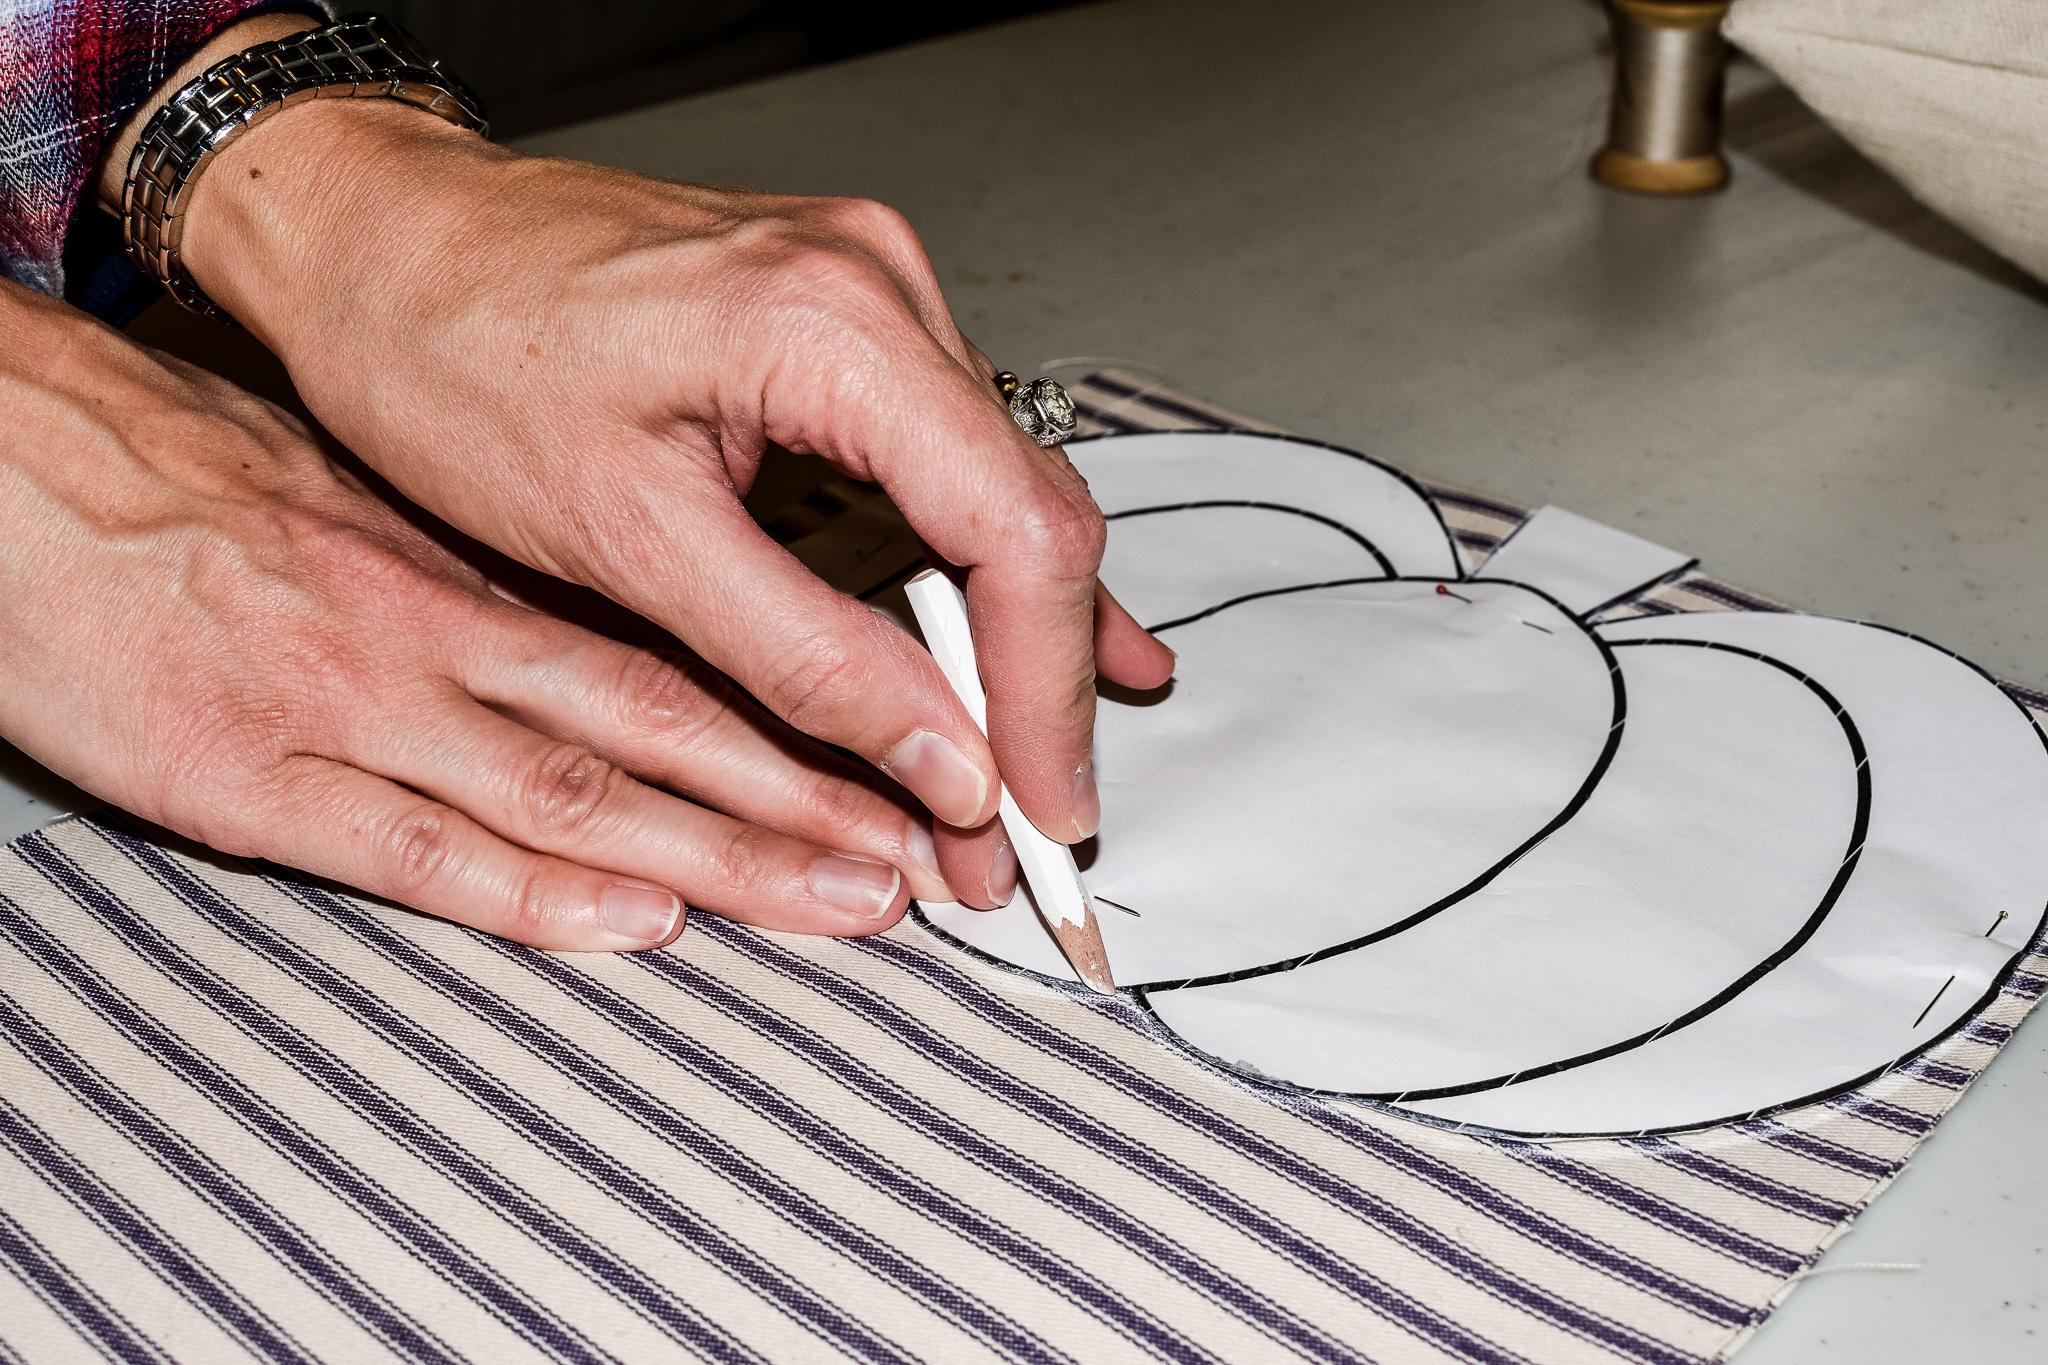 tracing a pumpkin template onto ticking fabric